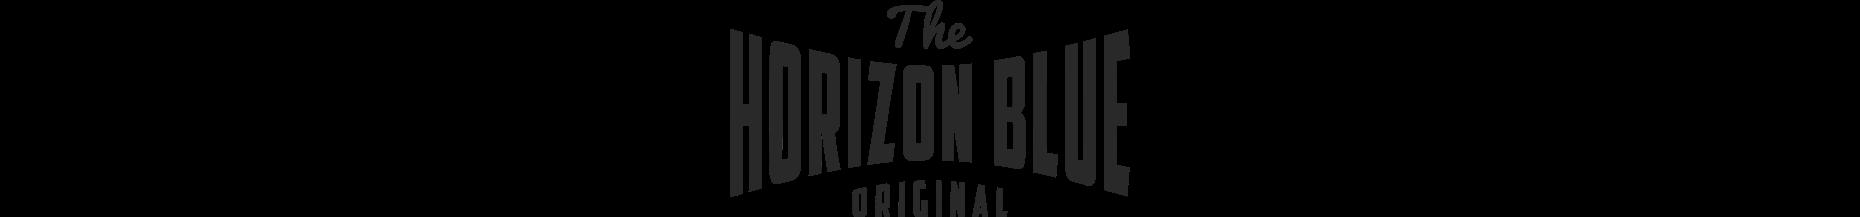 Tシャツ通販|Horizon Blue(ホリゾンブルー)